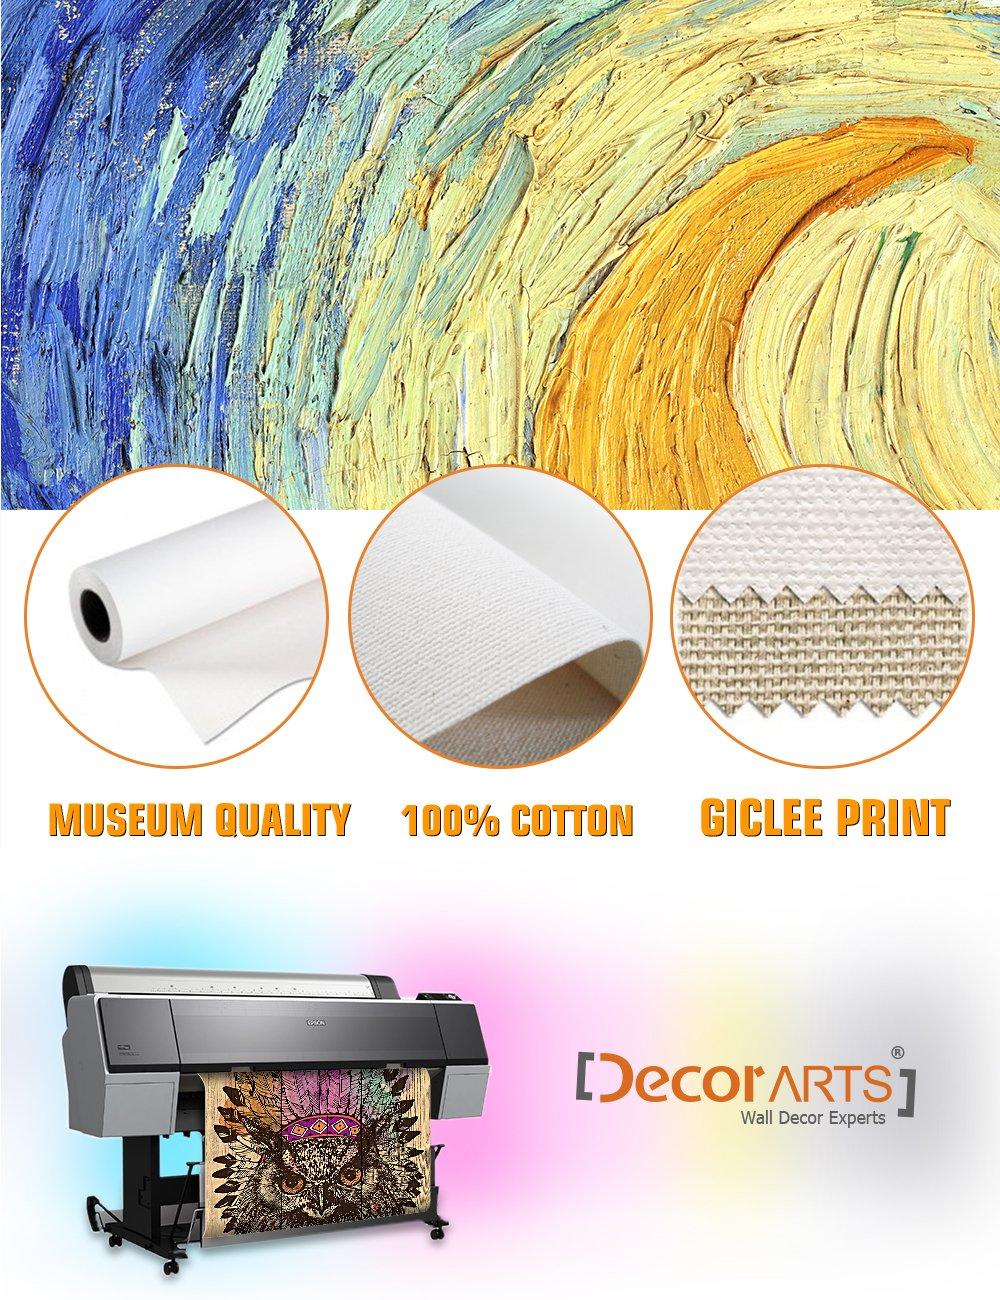 Amazon.com: DECORARTS Canvas Prints Wall Art - Eagle owl in an ...